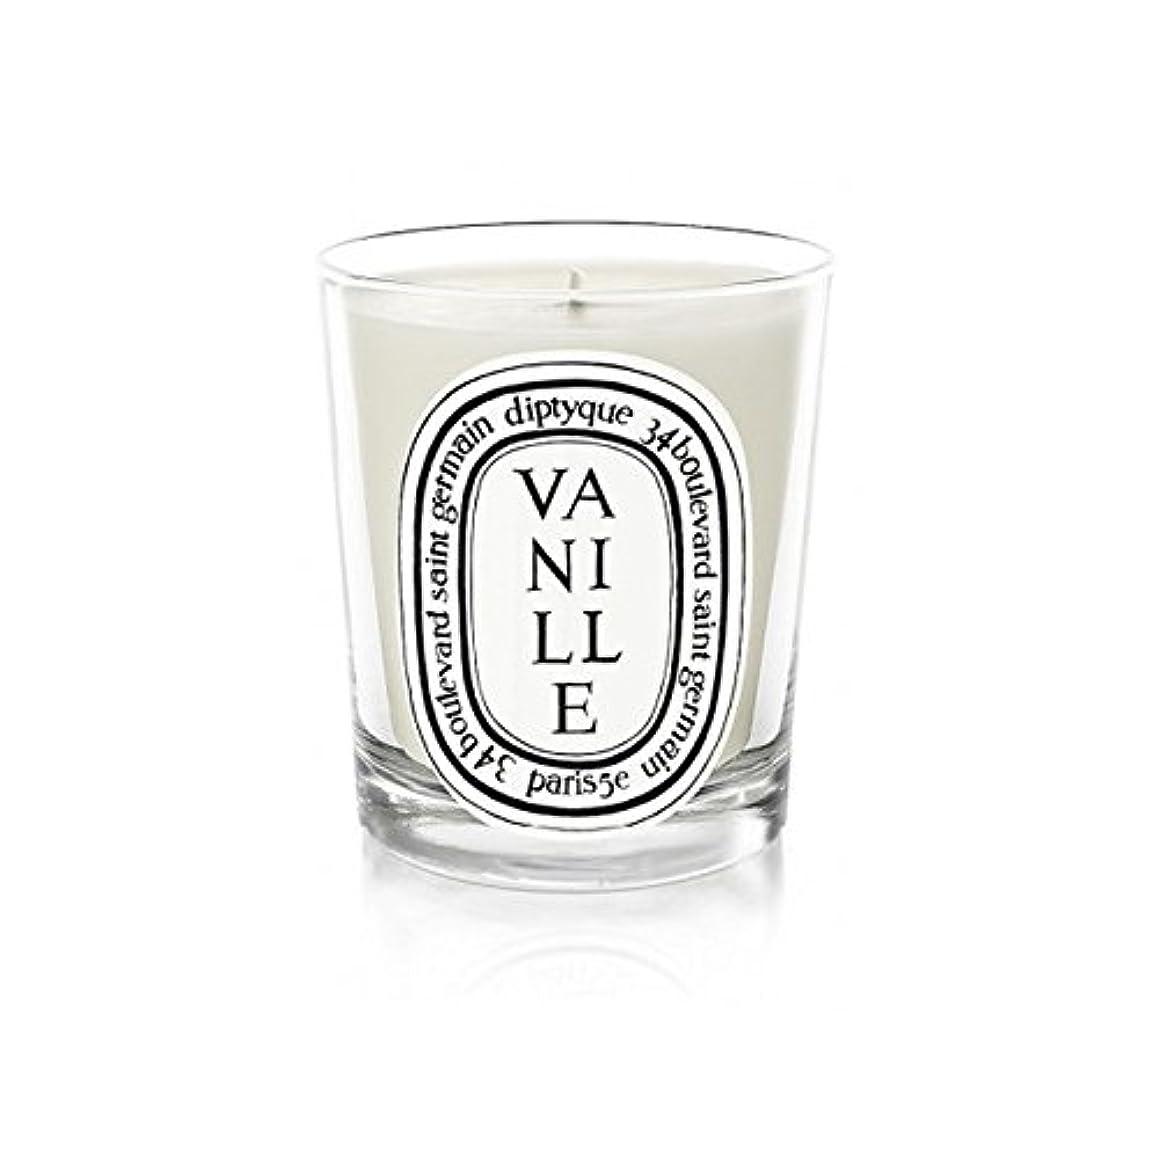 Diptyque Candle Vanille 190g (Pack of 2) - Diptyqueキャンドルバニラ190グラム (x2) [並行輸入品]